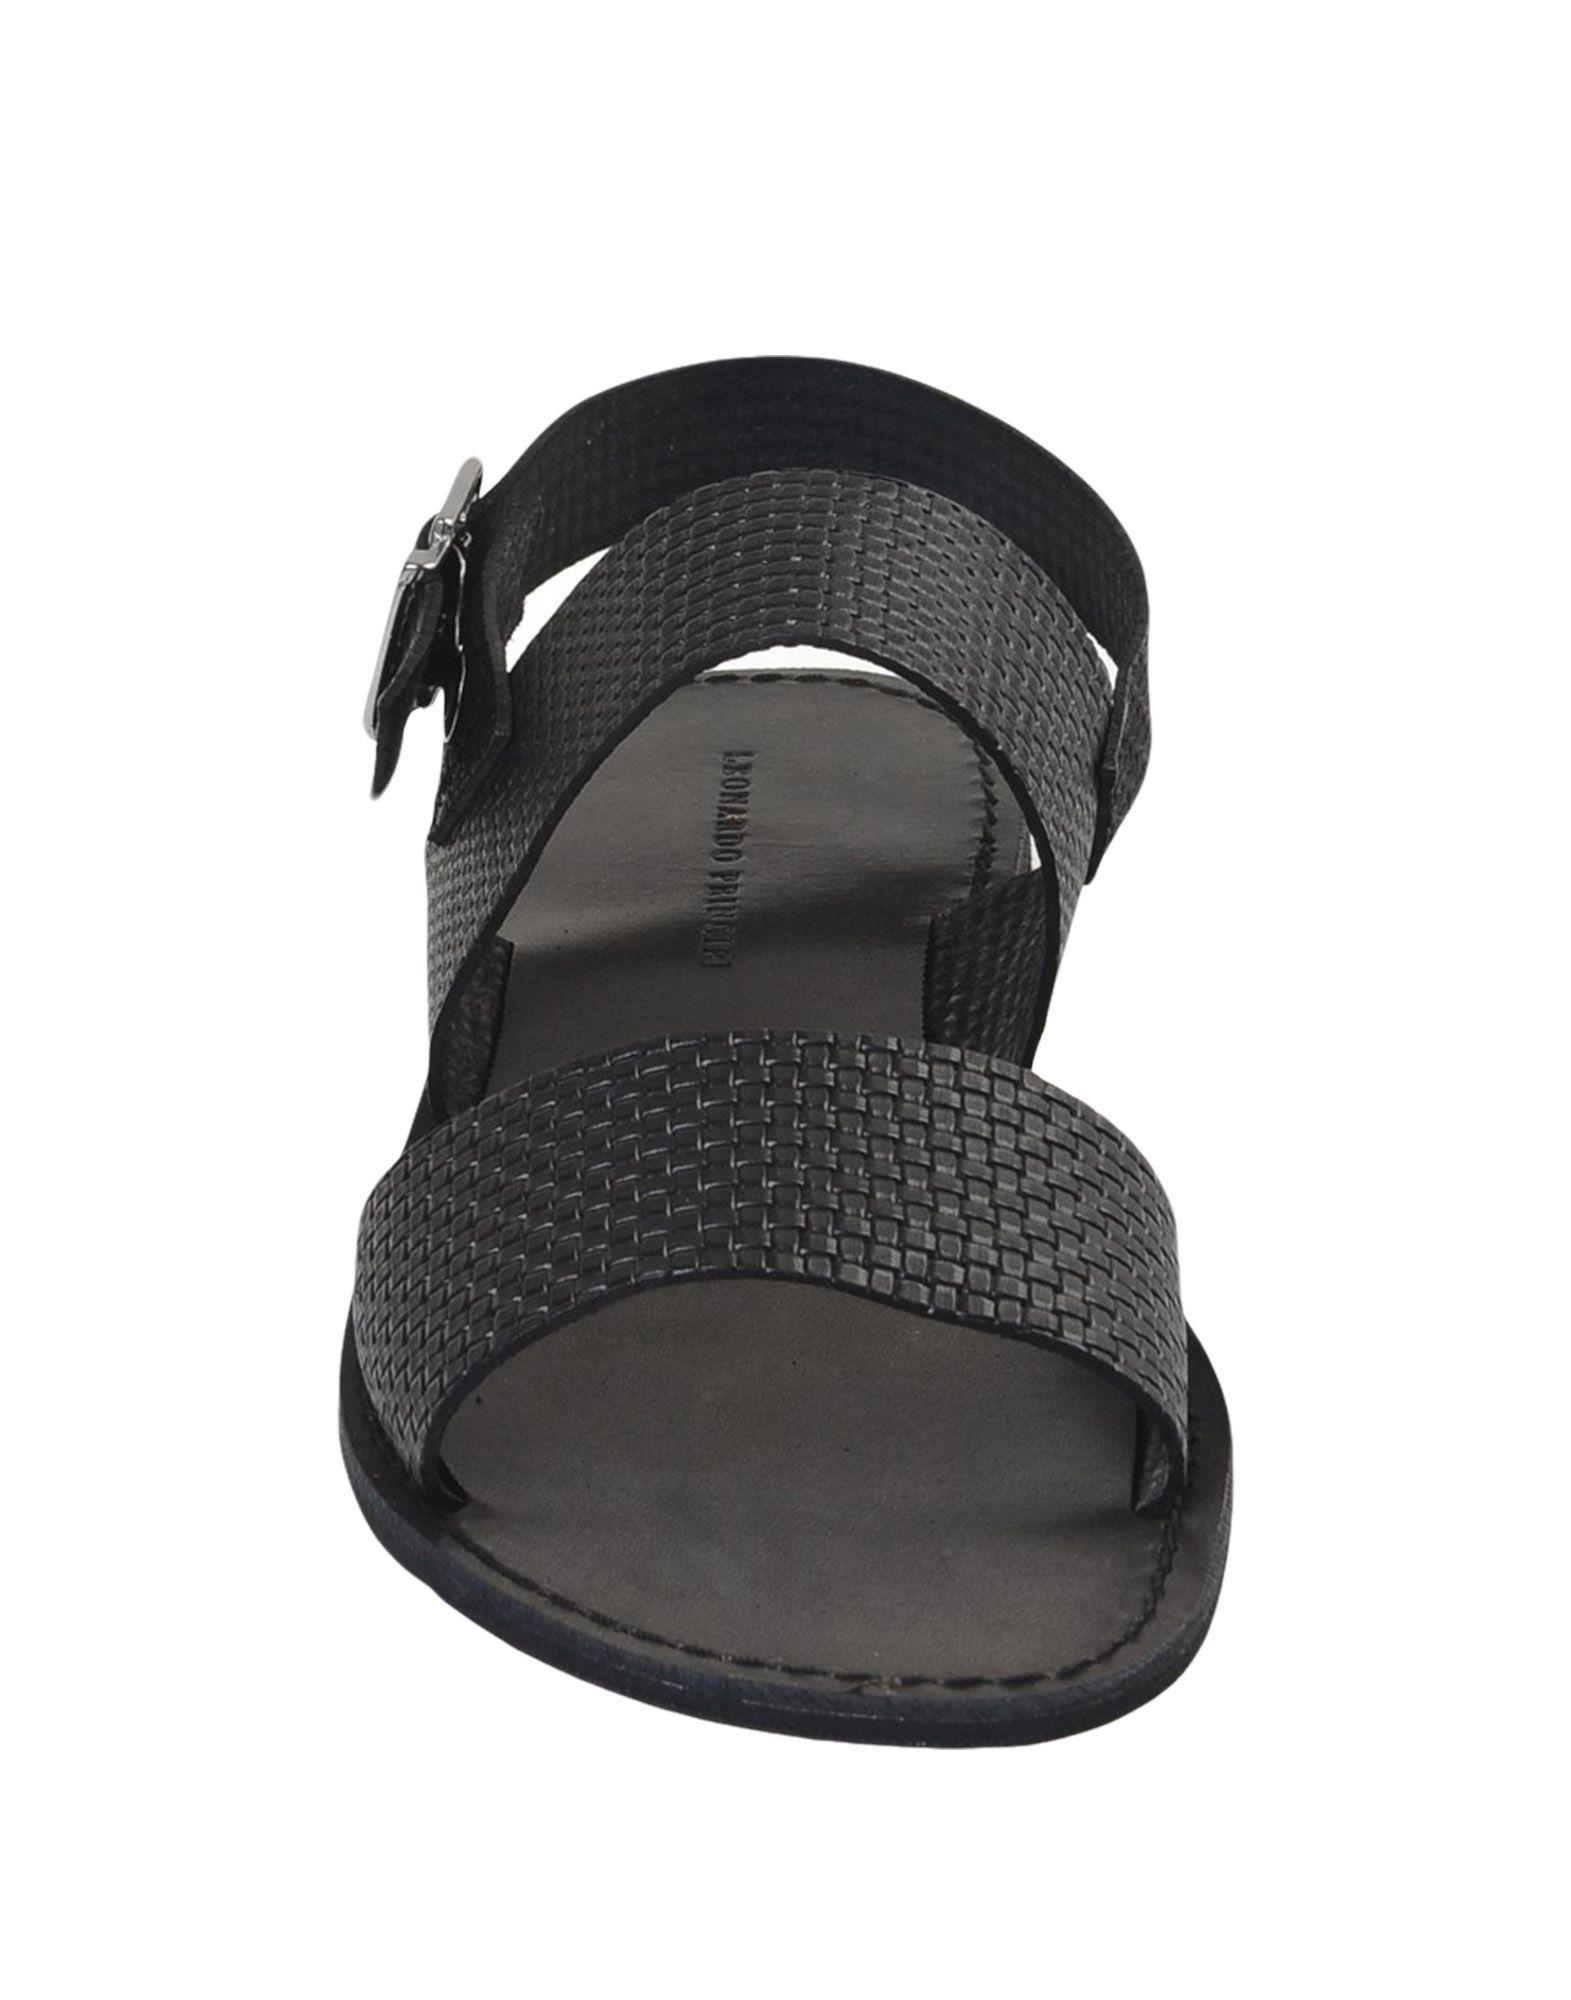 Rabatt 11466785IV echte Schuhe Leonardo Principi Sandalen Herren  11466785IV Rabatt 4300de